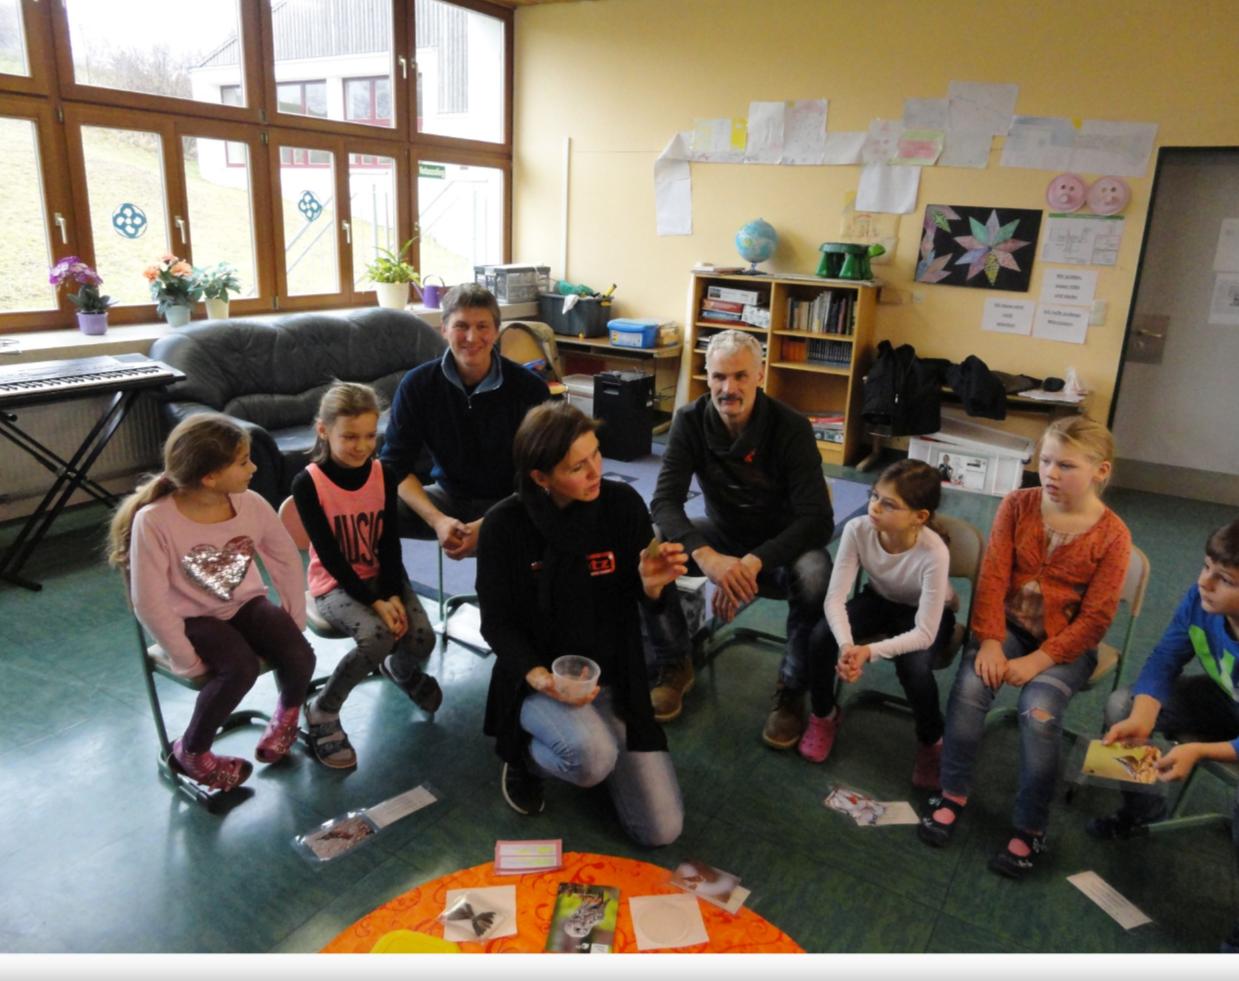 Schulklassenprogramm Foto: C. Kainz